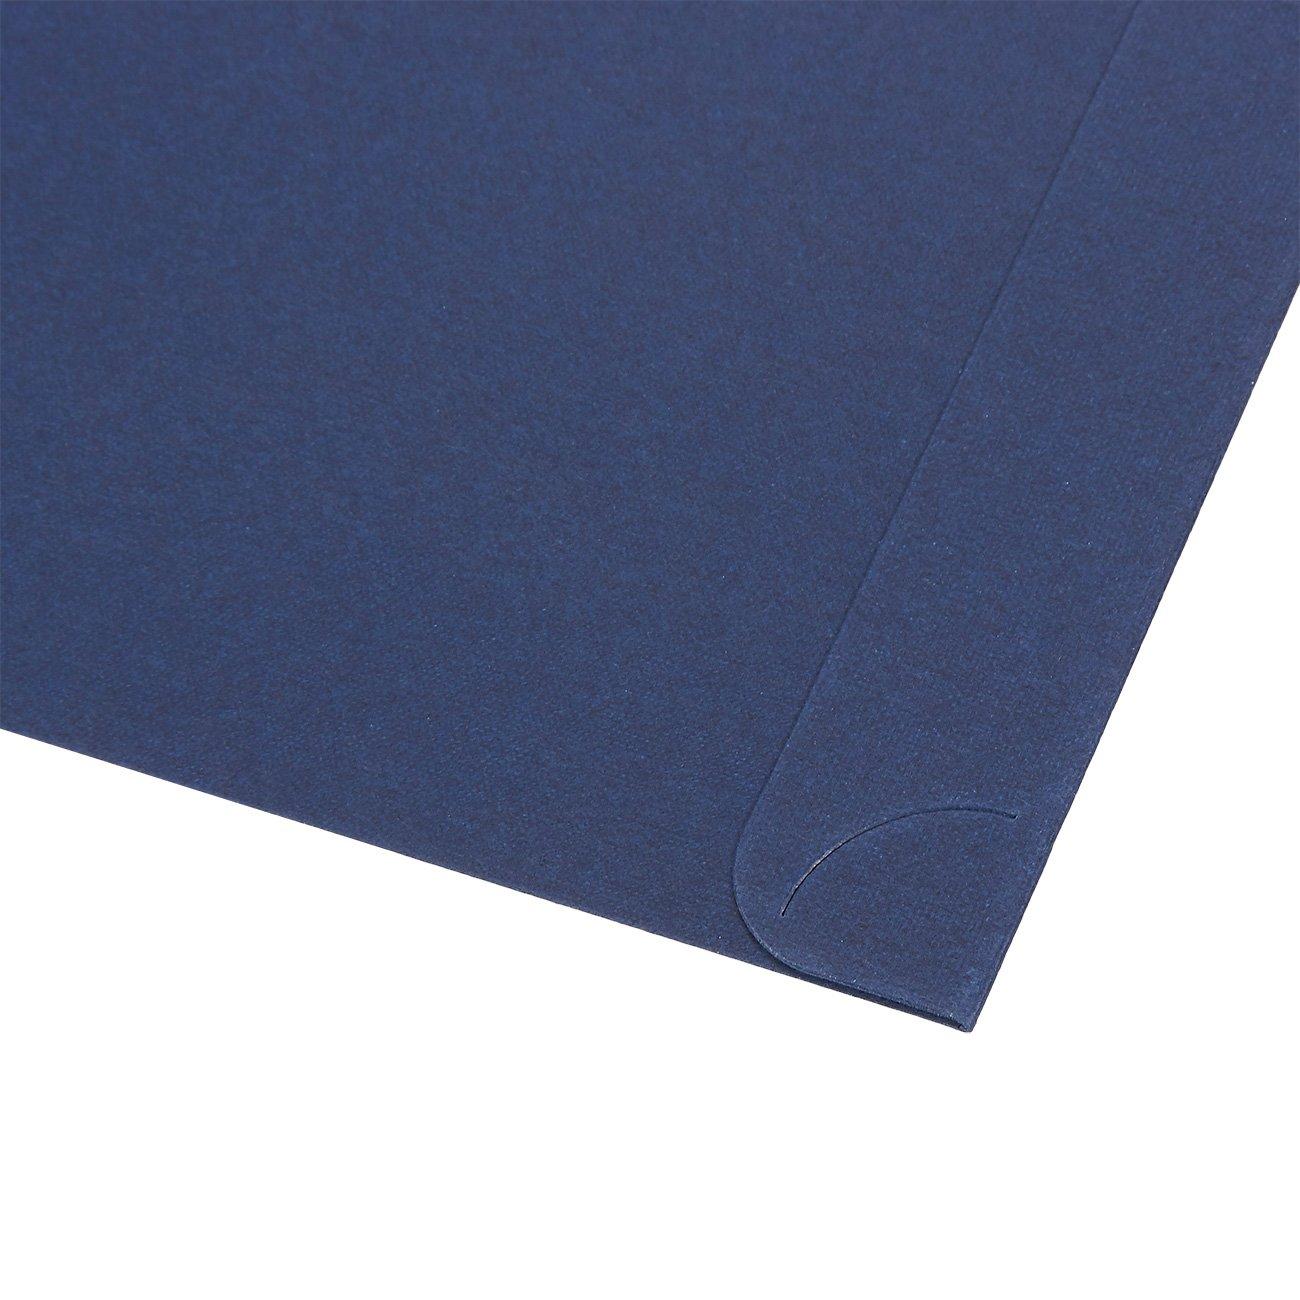 12-pack certificate Holder/ blu 22/x 30.8/centimetres cover per documenti A4/letter-sized Award certificati /diploma cover